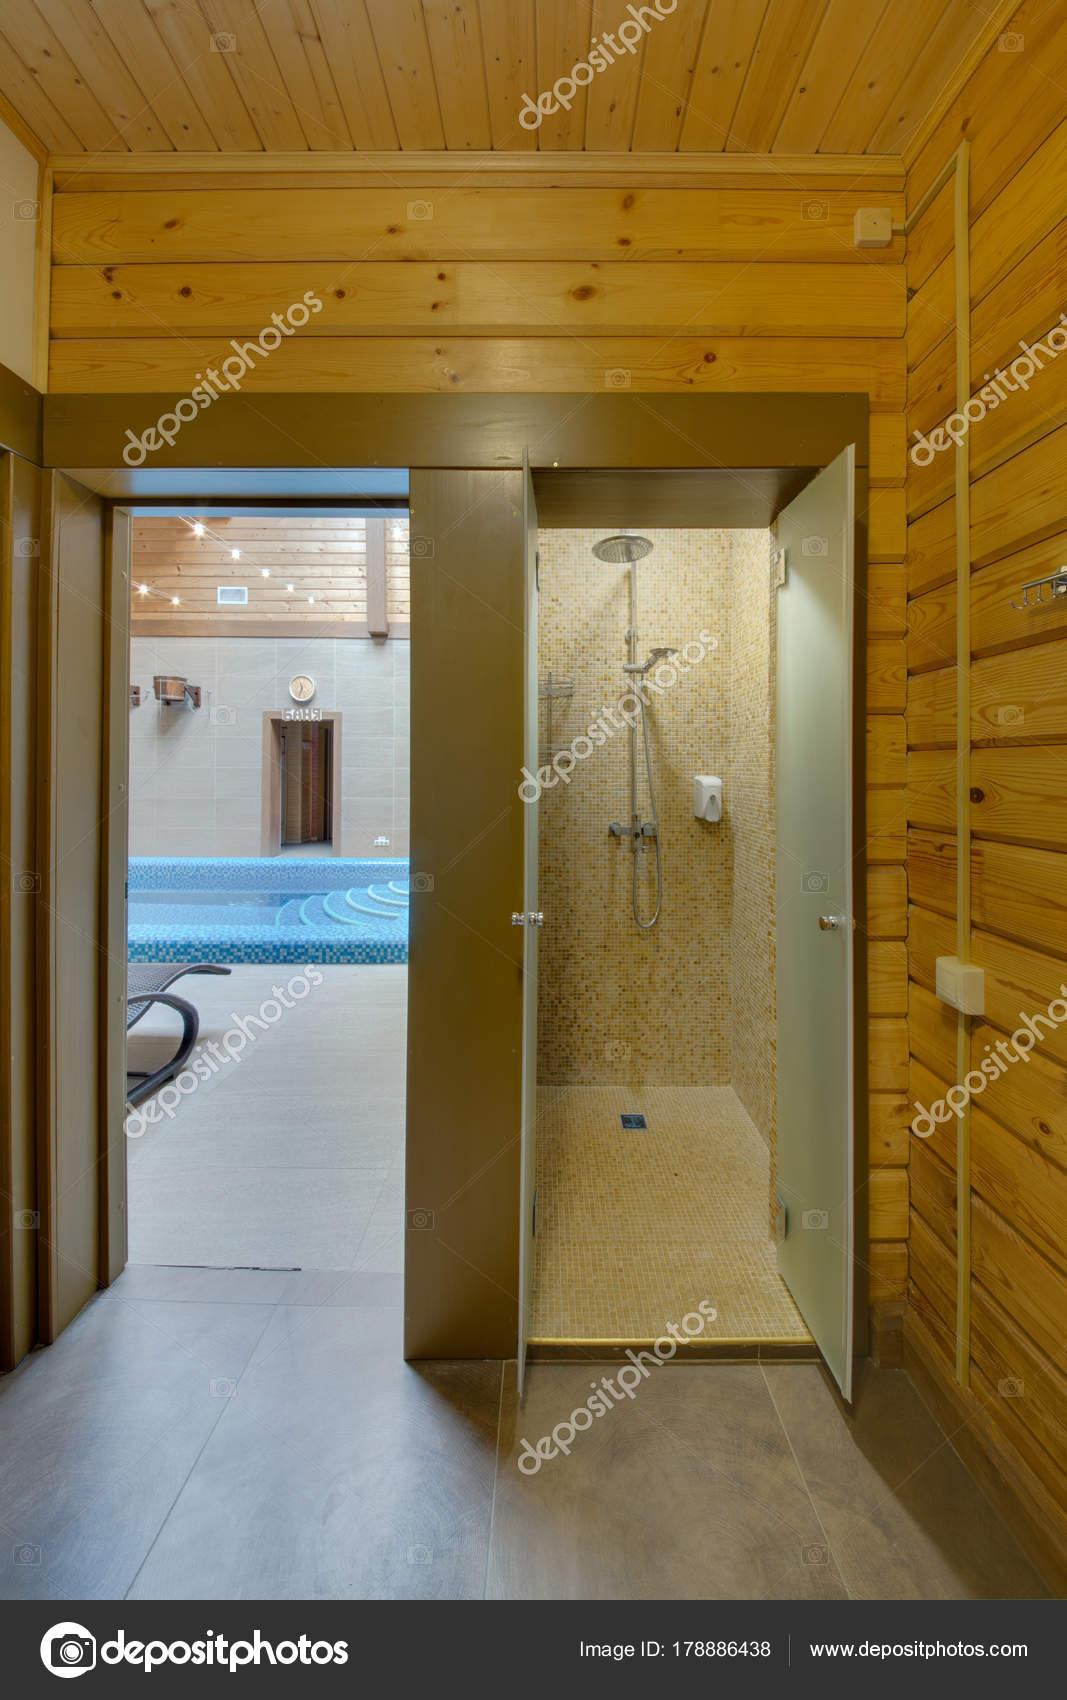 Shower Room Locker Room Exit Pool — Stock Photo © twins03 #178886438